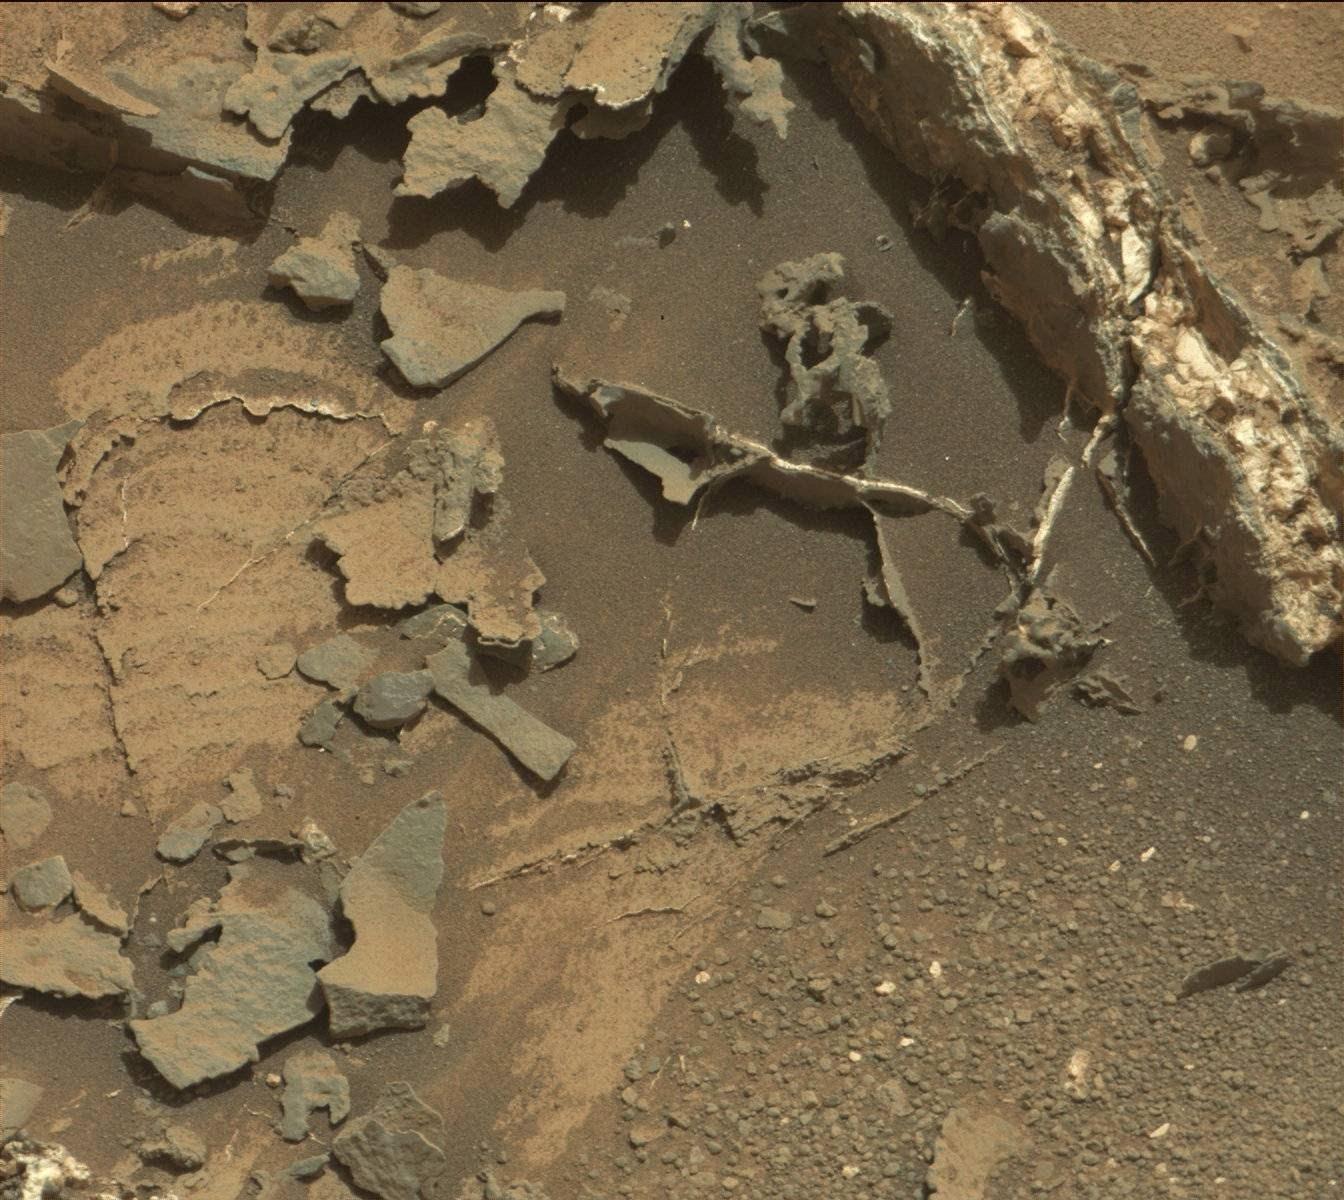 mars curiosity rover recent news - photo #24